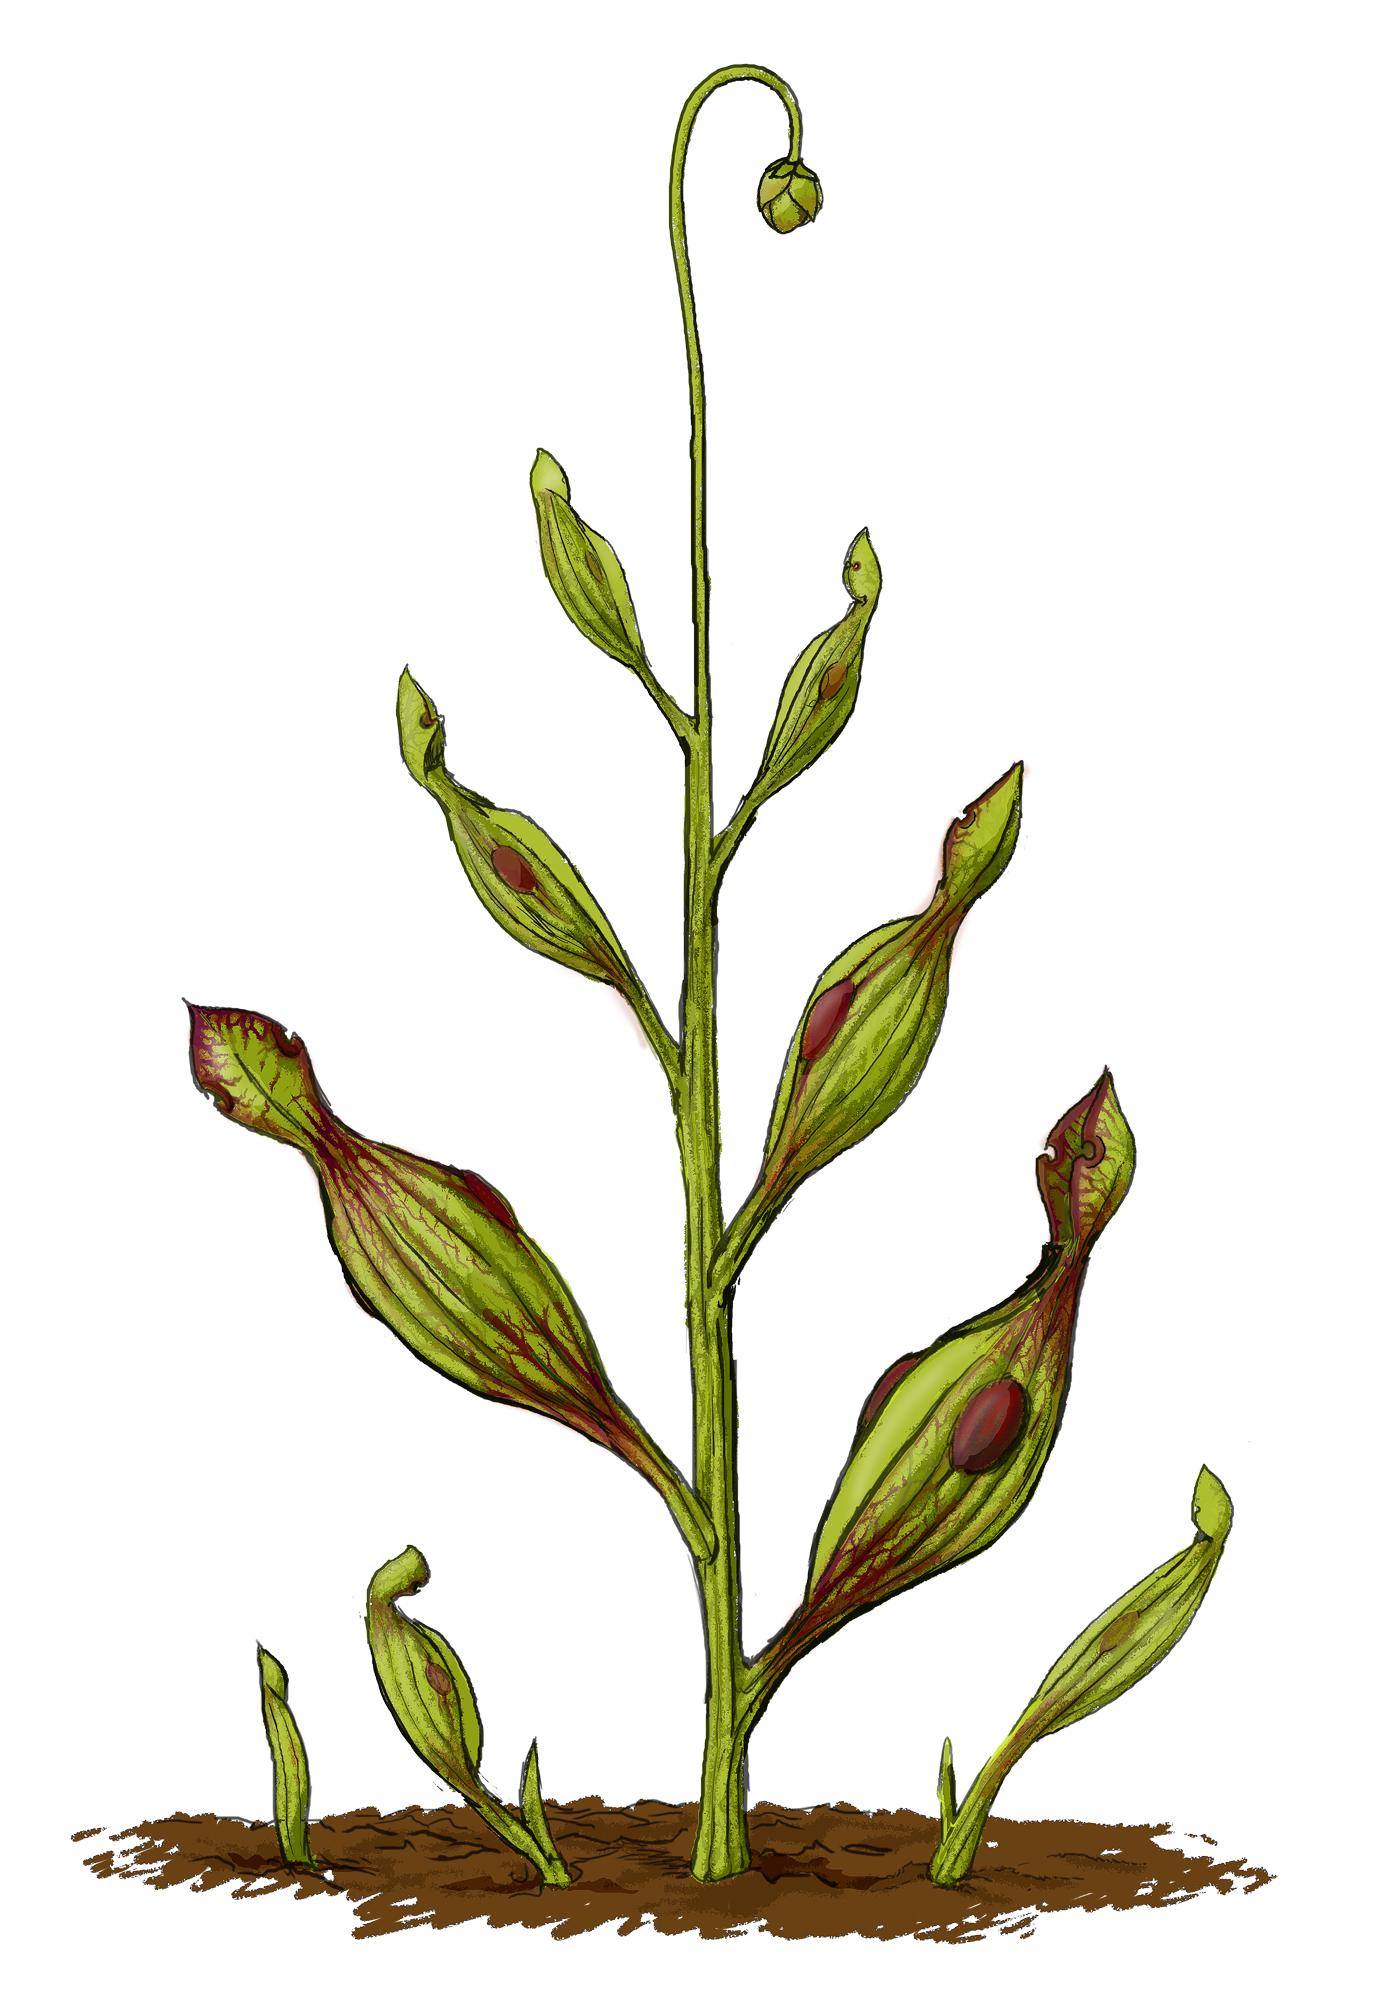 Achaeamphora longicervia